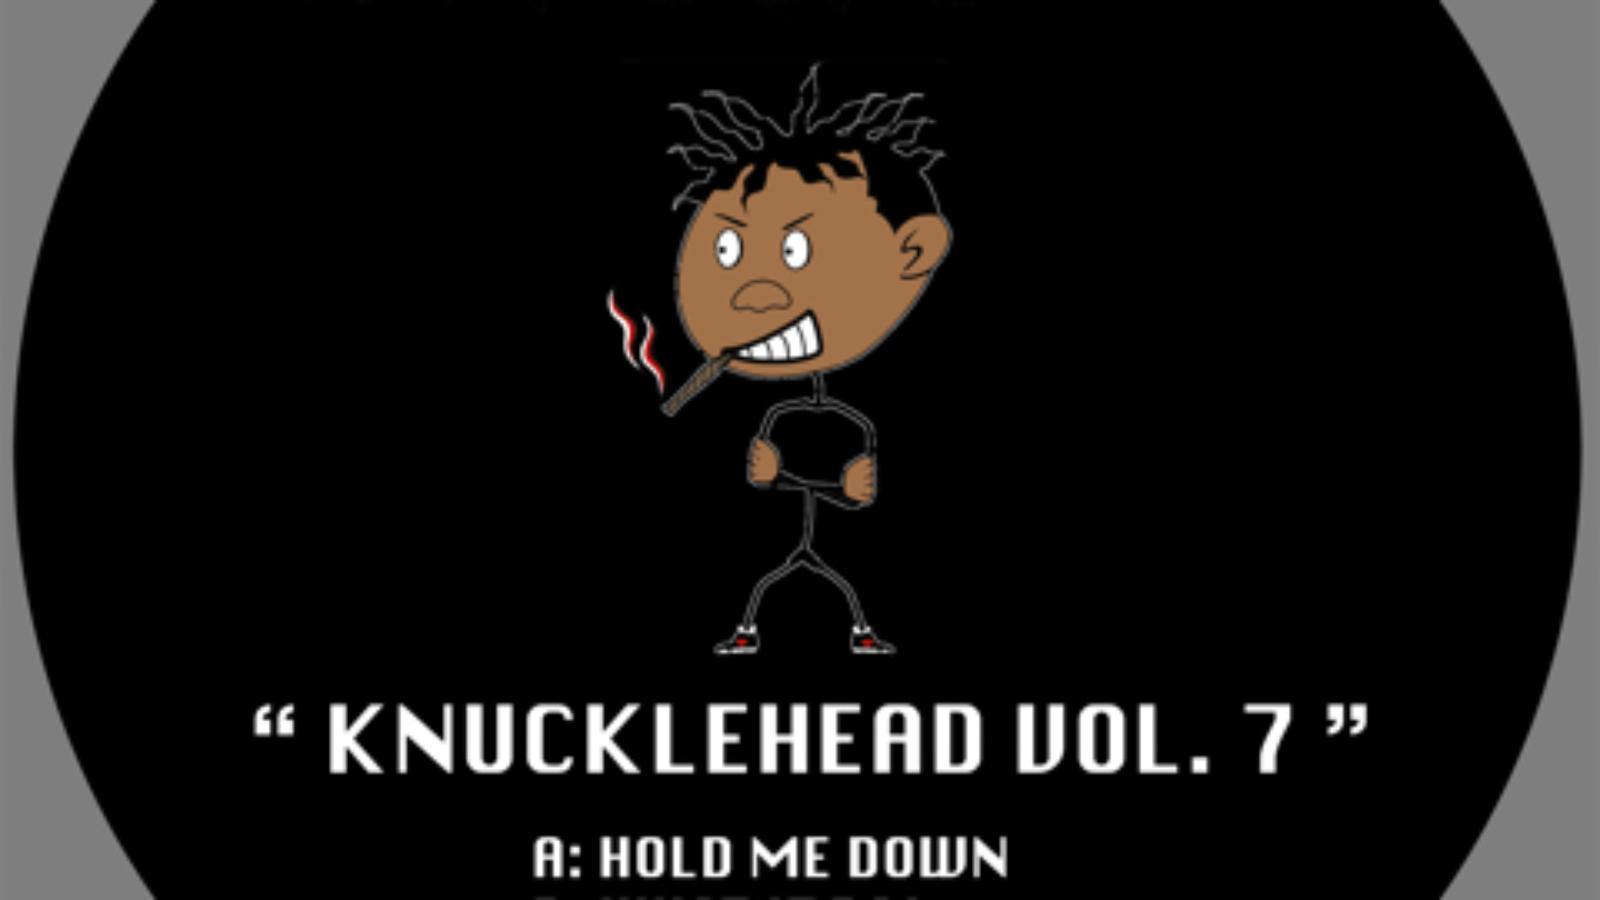 EddieFowlkes_KnuckleheadVol7_Artwork